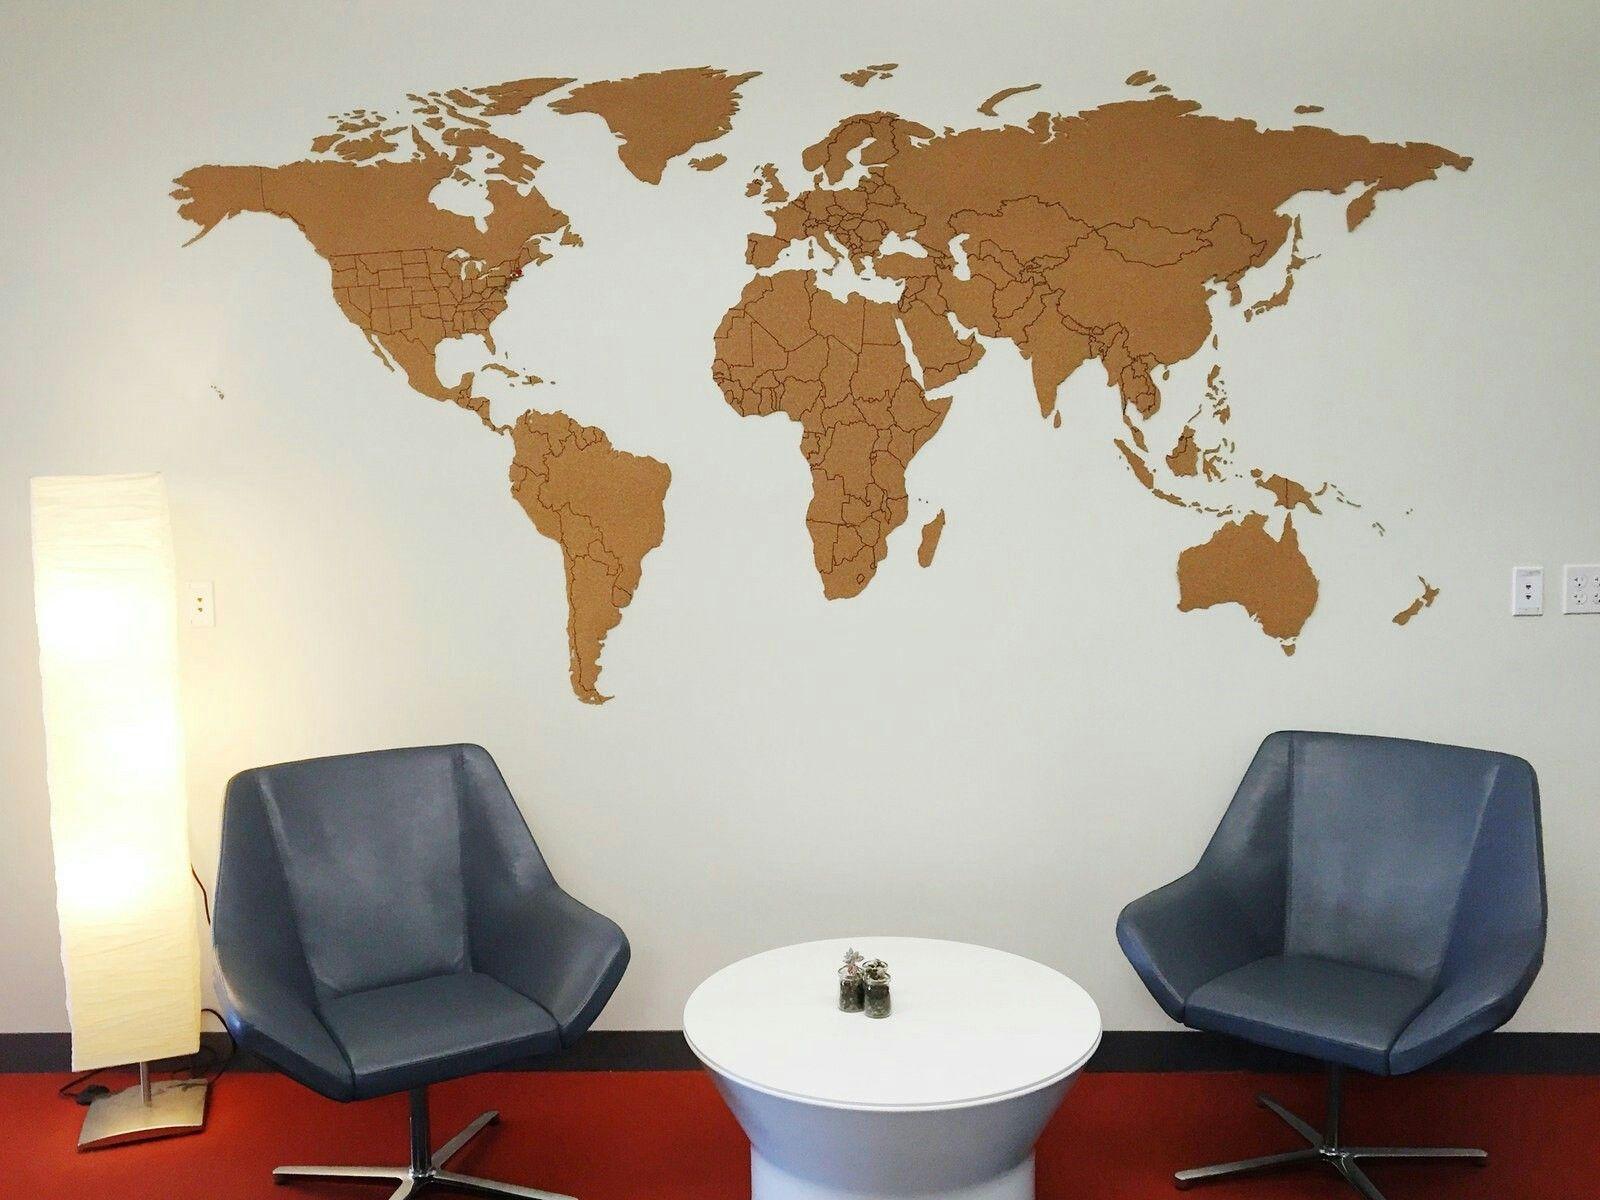 Corkboard world map taylor back entry pinterest corkboard world map gumiabroncs Images